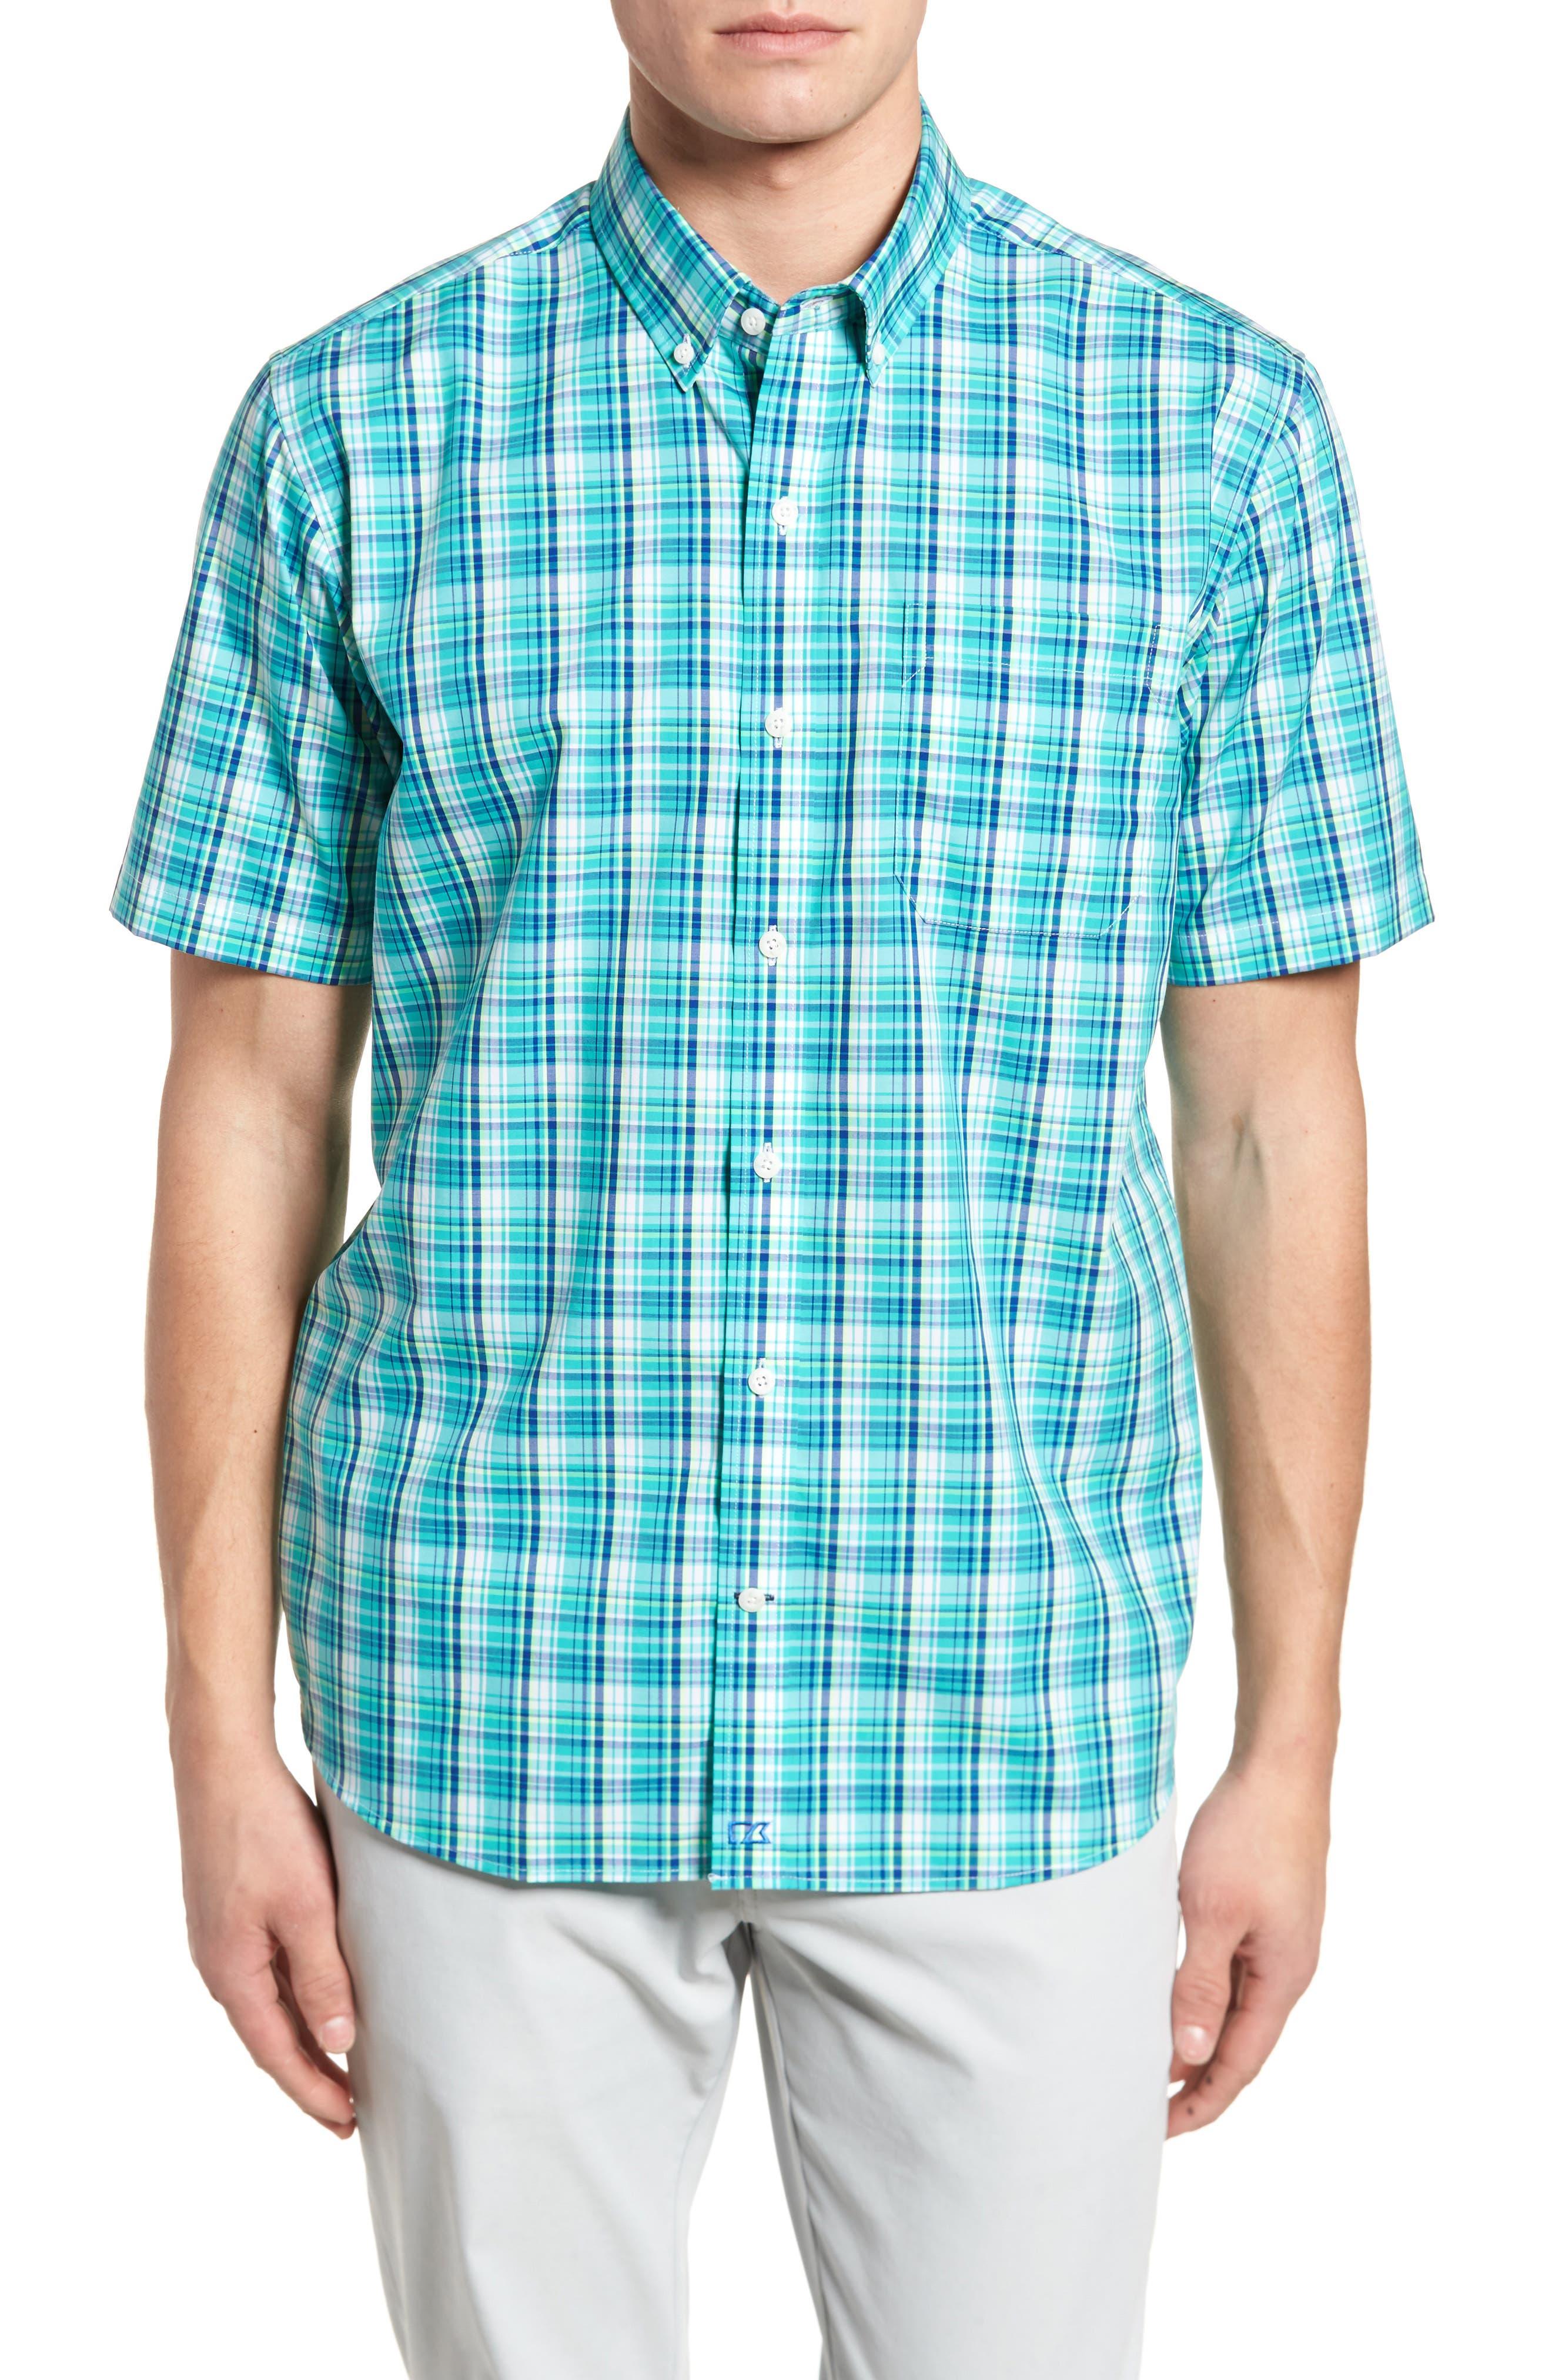 Tobias Non-Iron Plaid Woven Shirt,                         Main,                         color, Newport